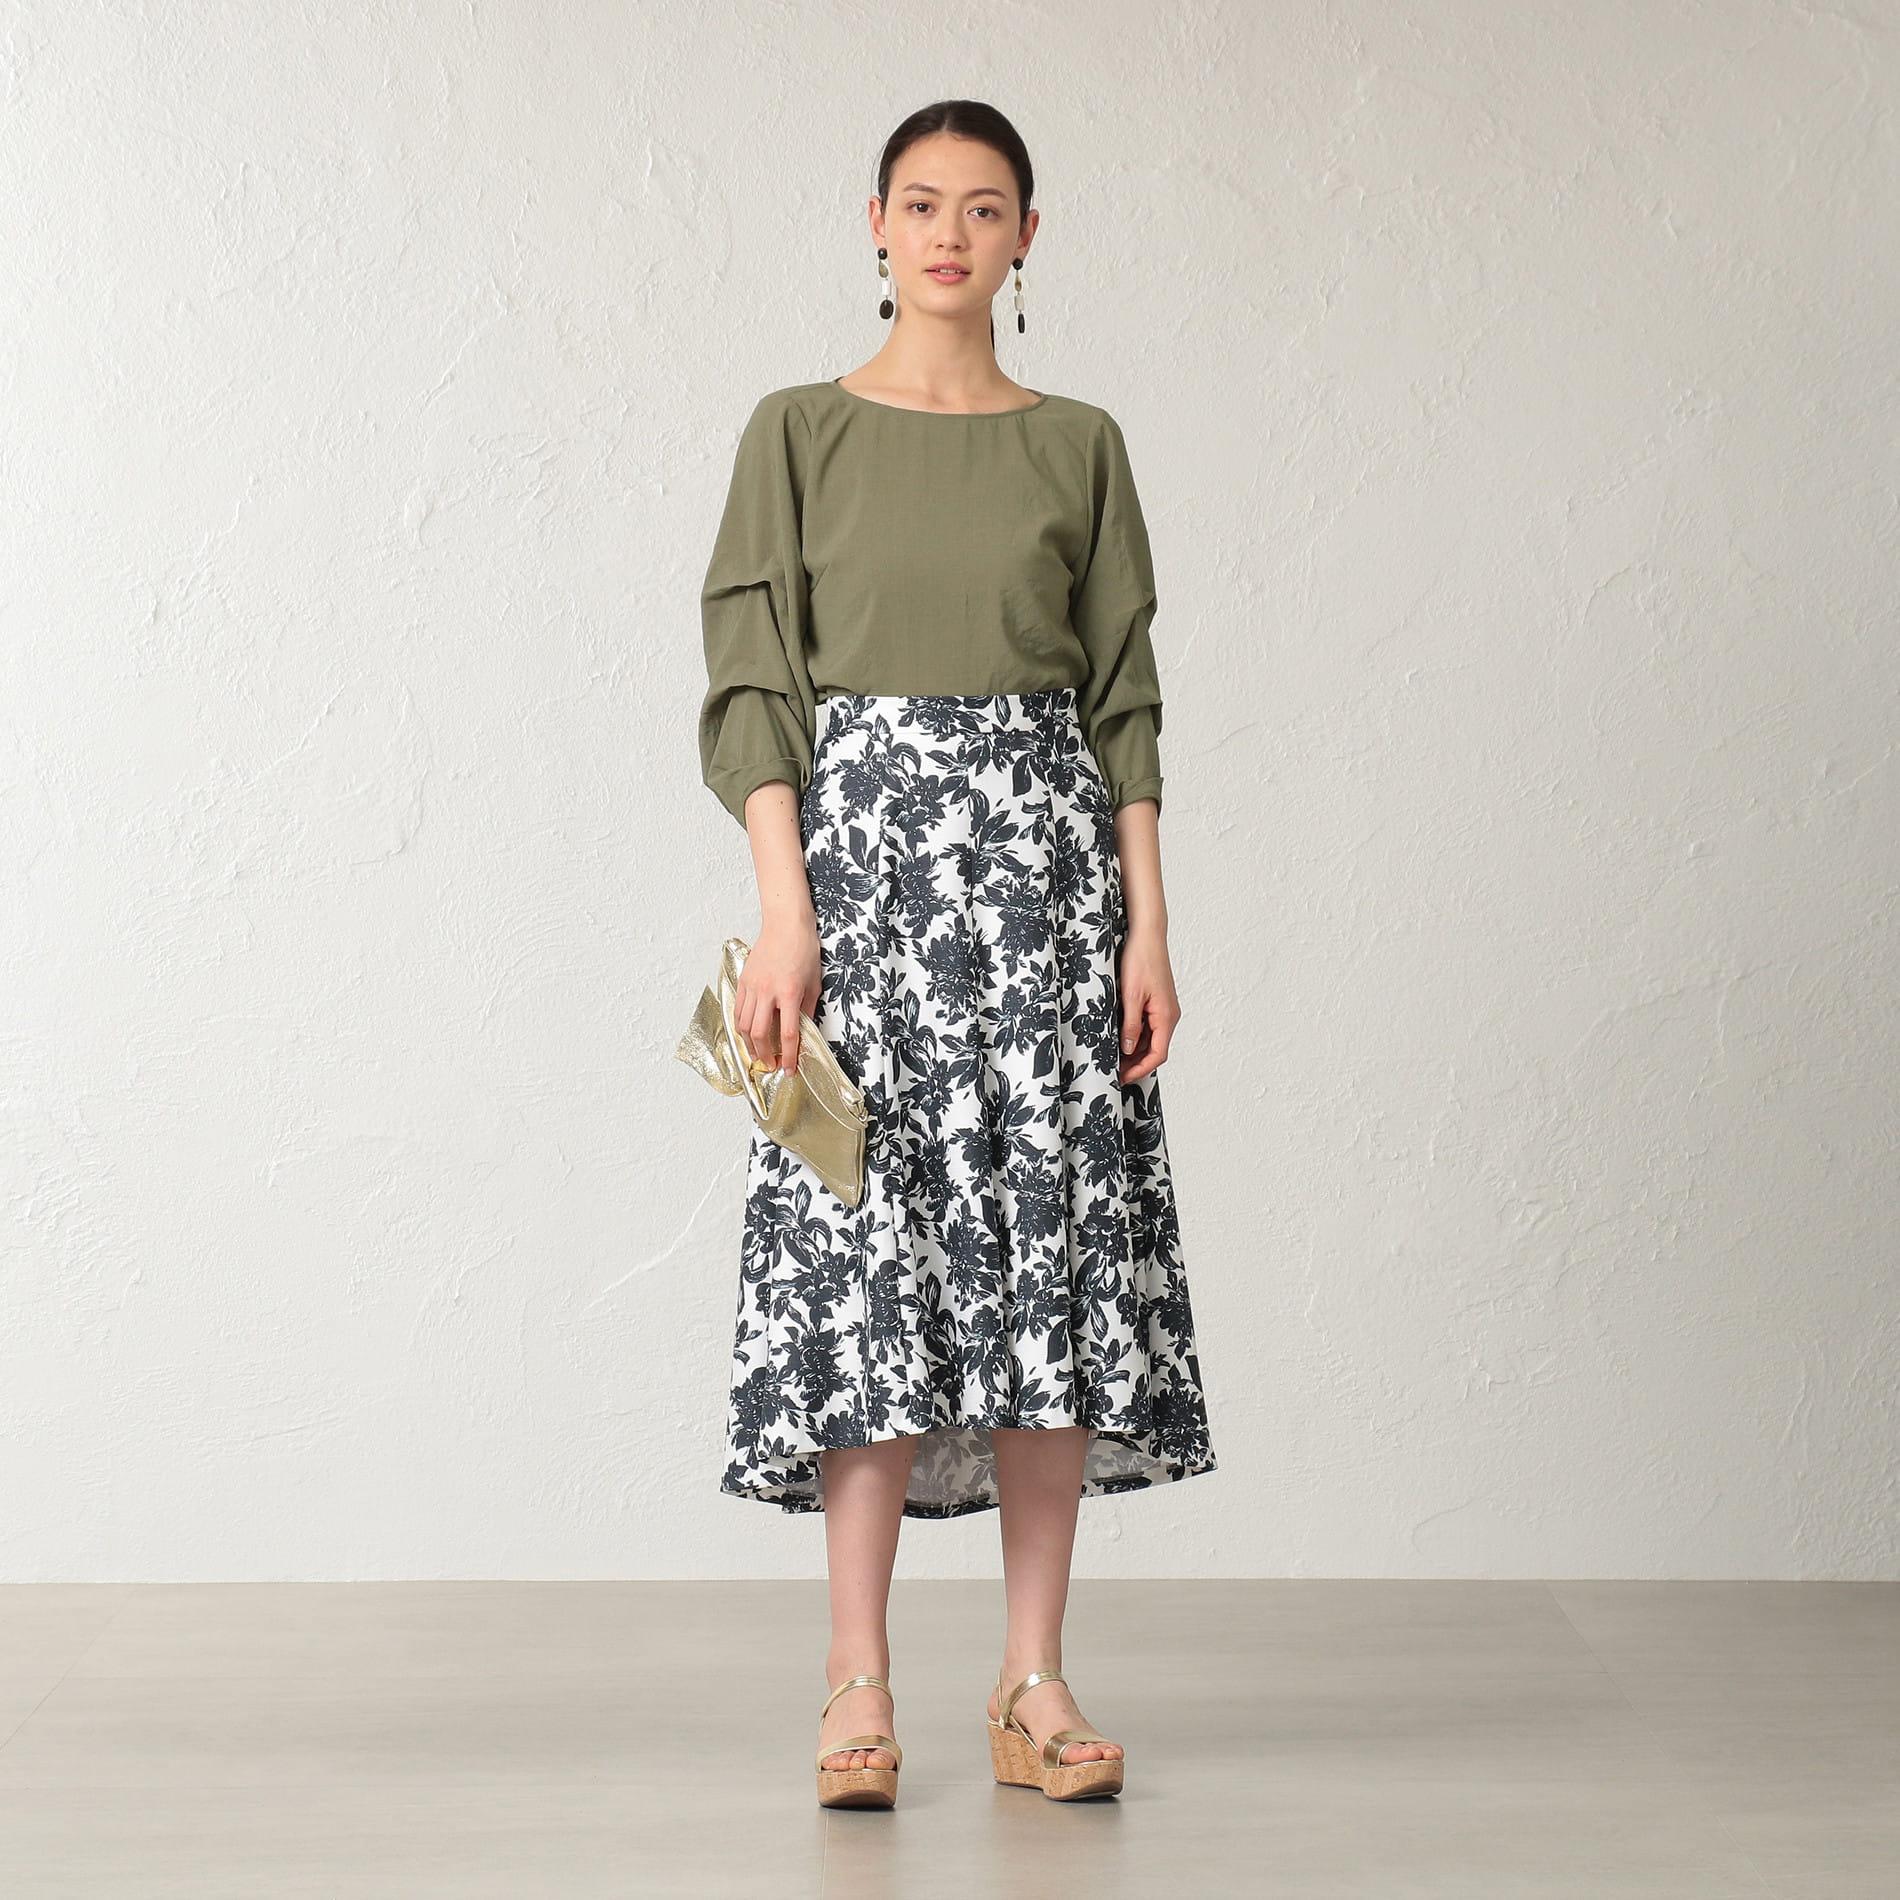 【E_EPOCA THE SHOP】フラワープリントスカート